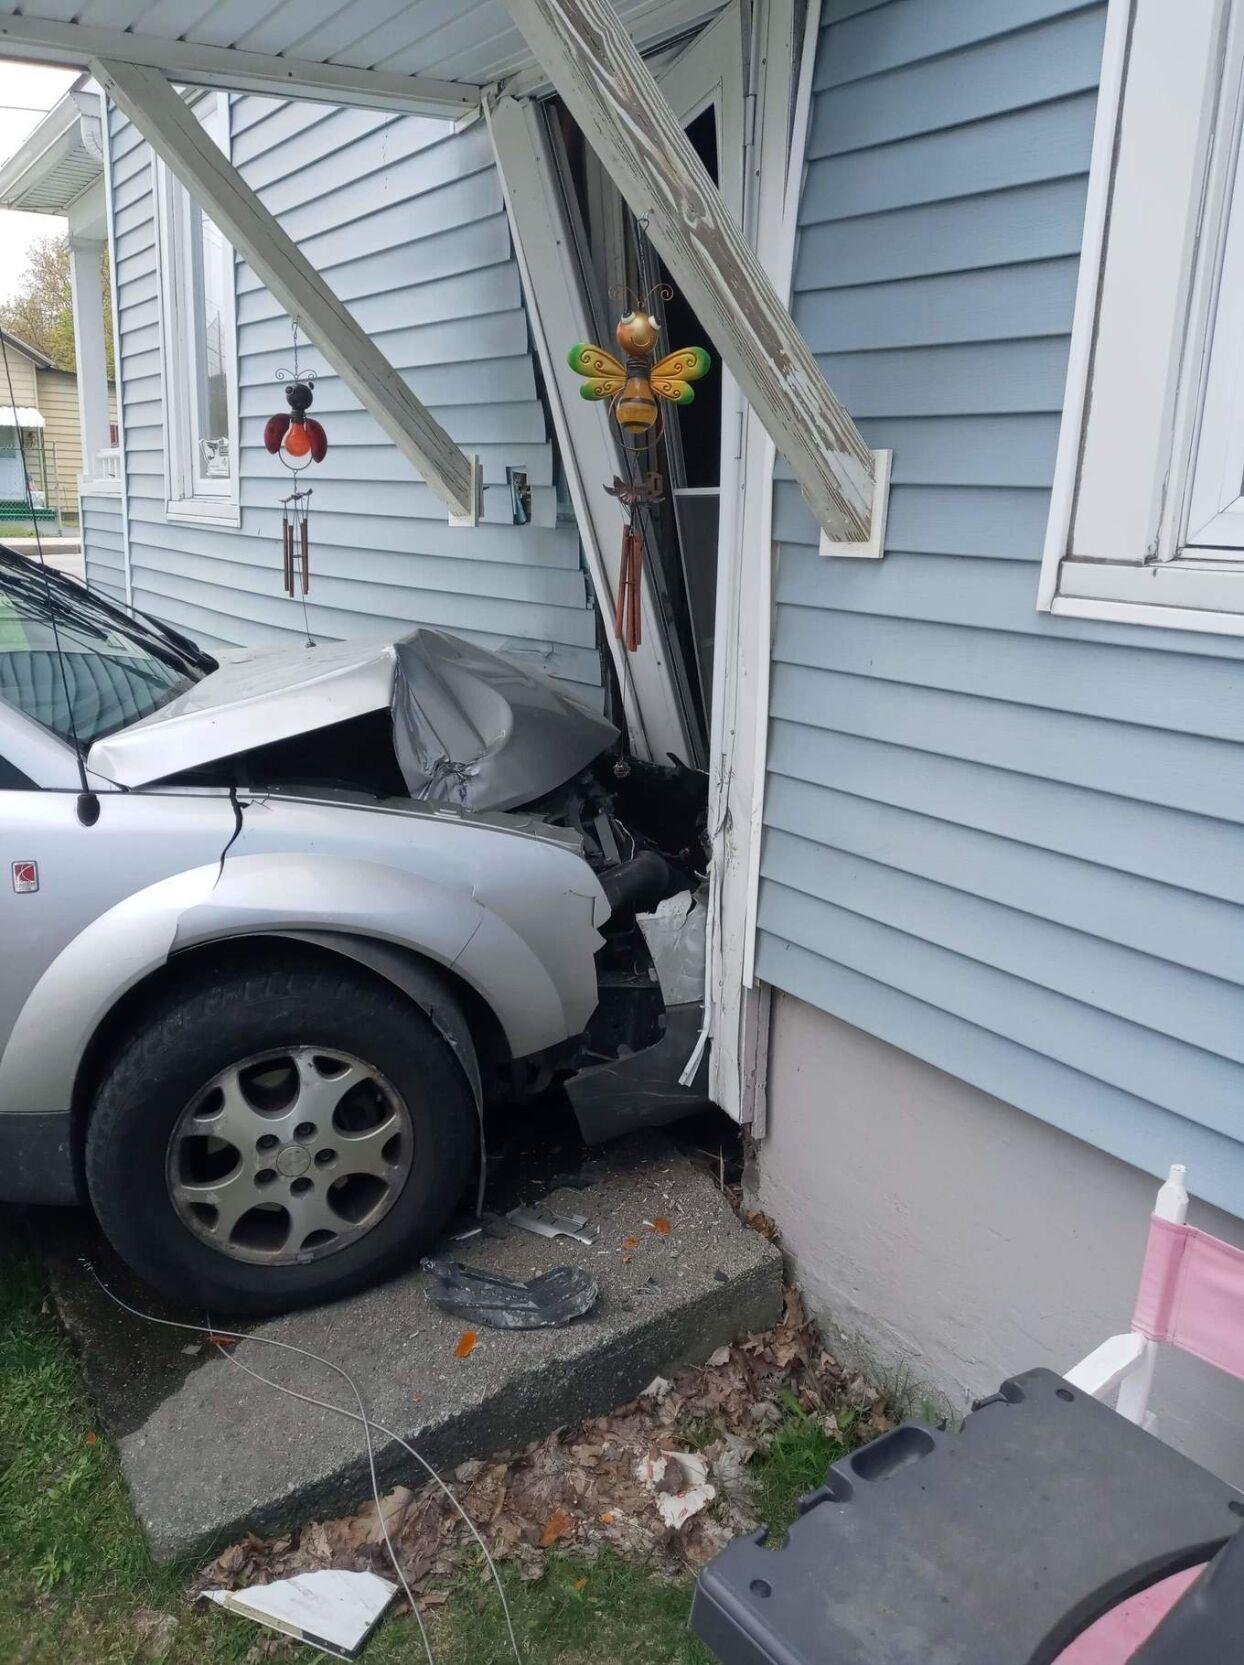 Bennington car-residence crash - 4/27/21